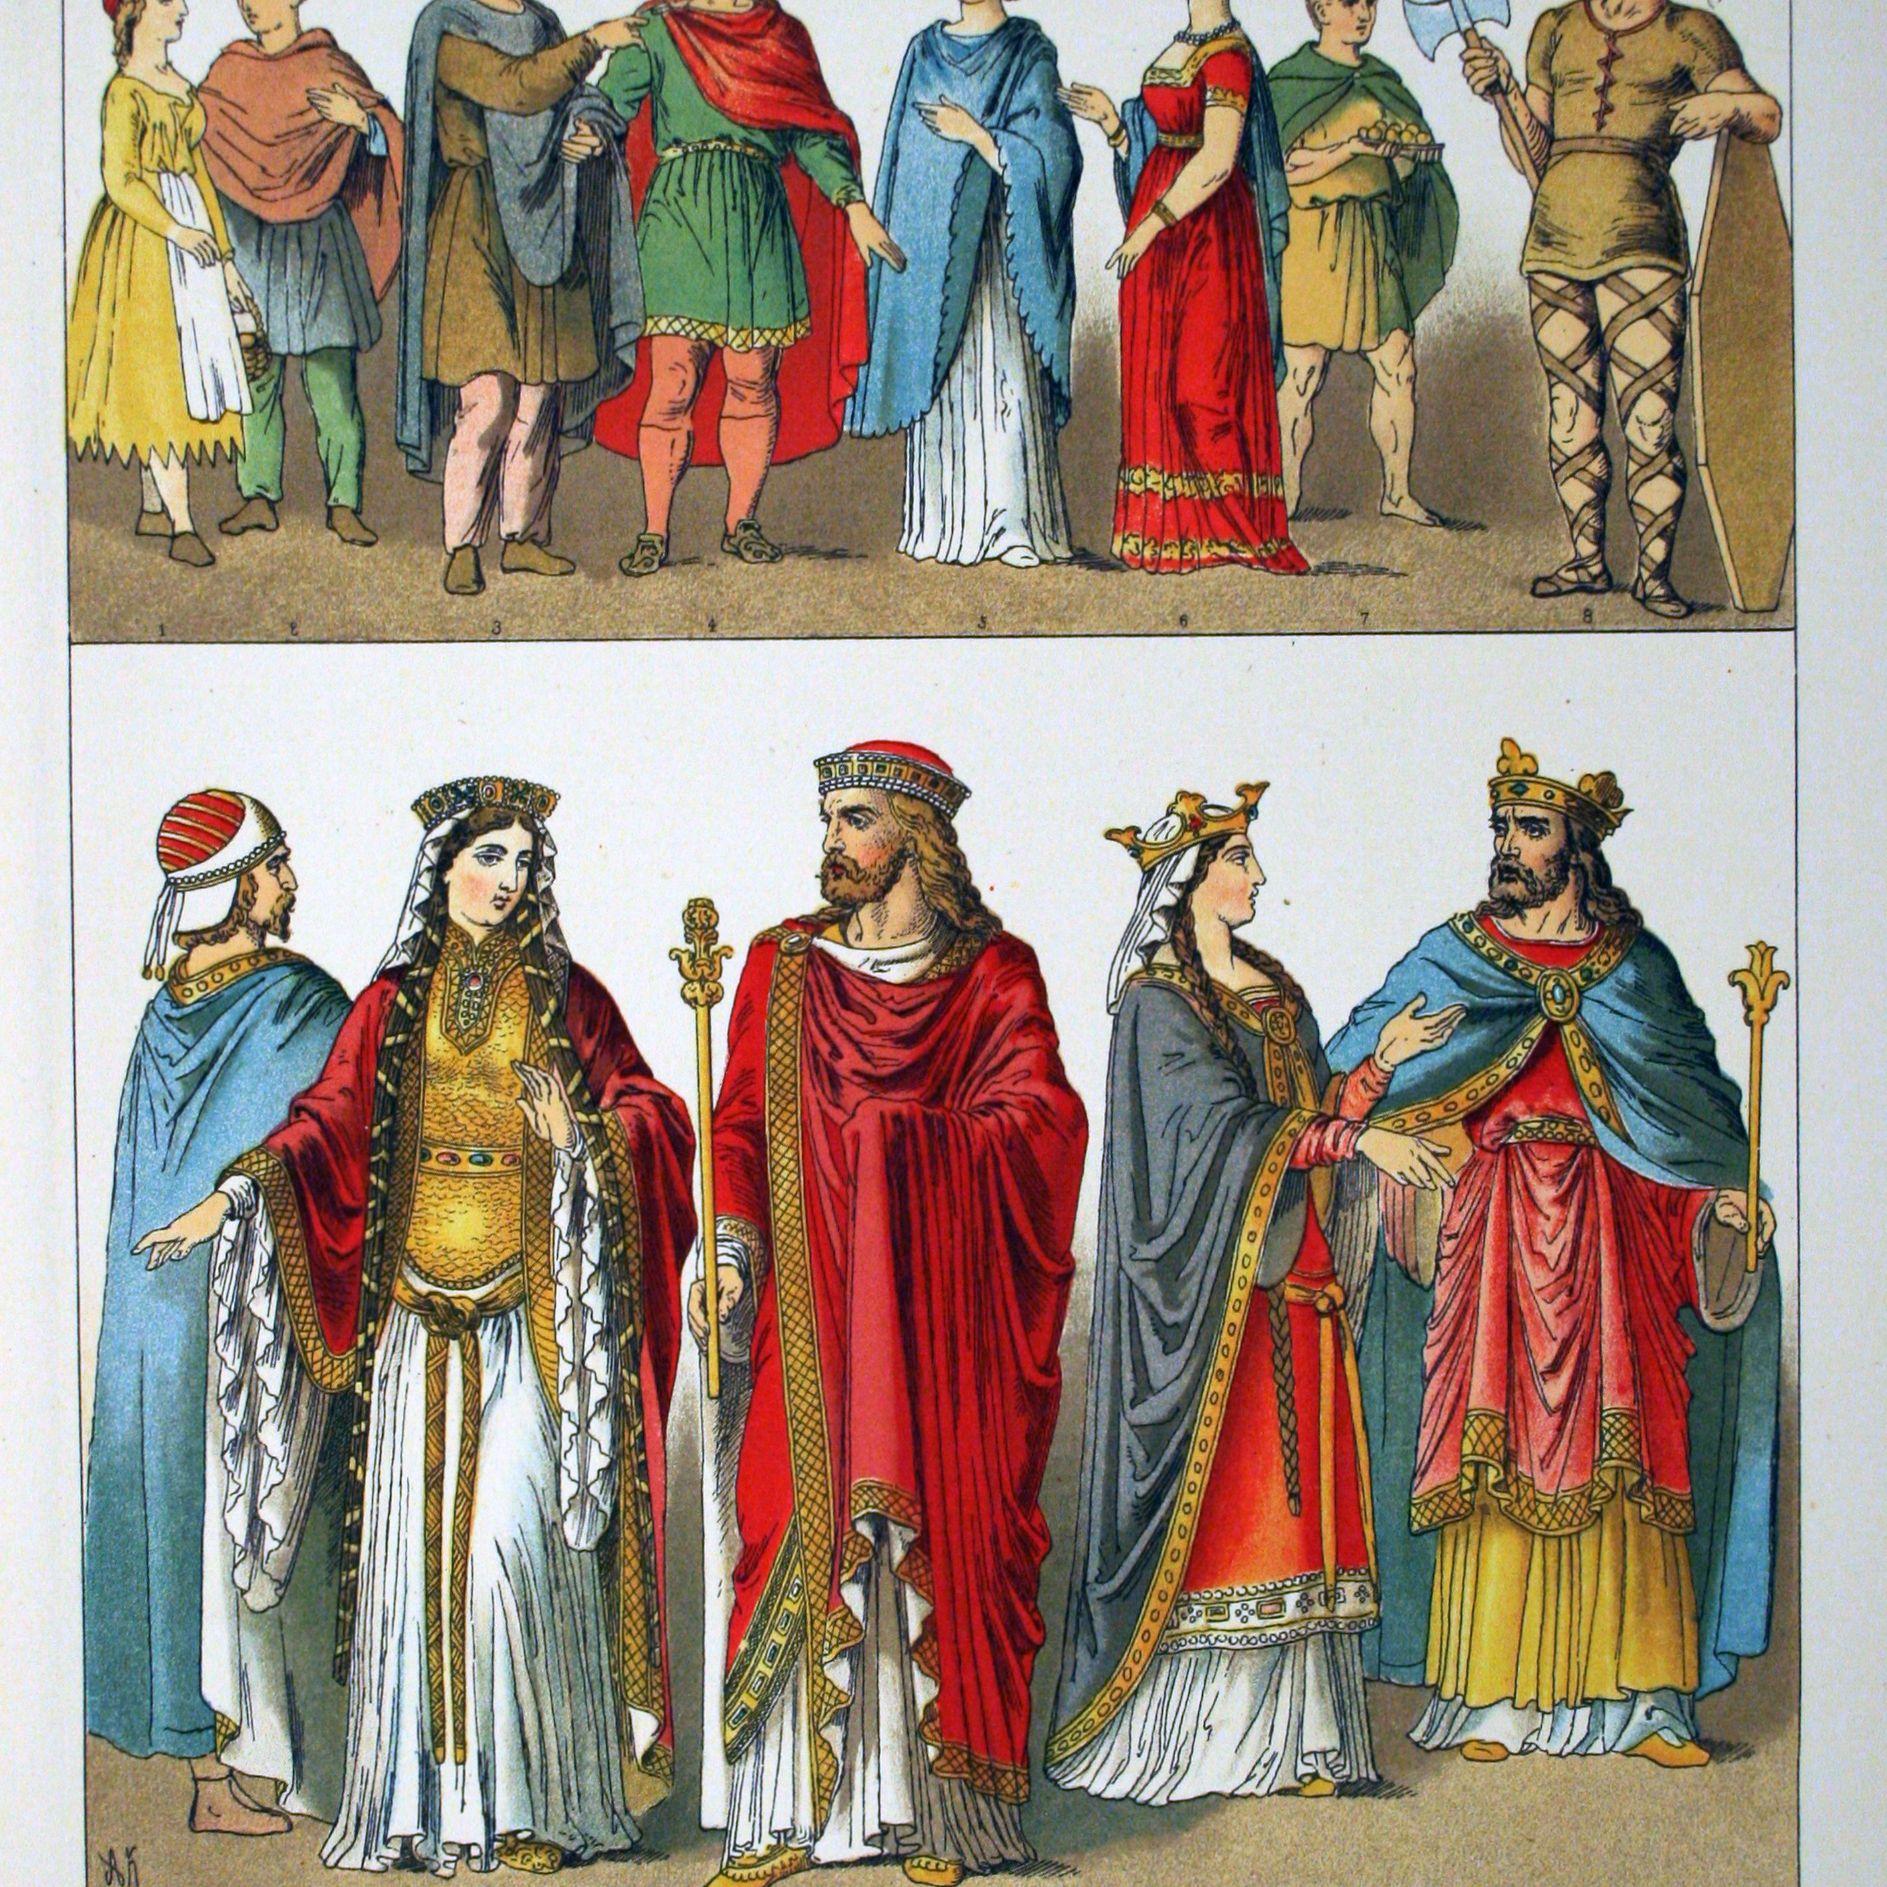 Franks, dress and costume